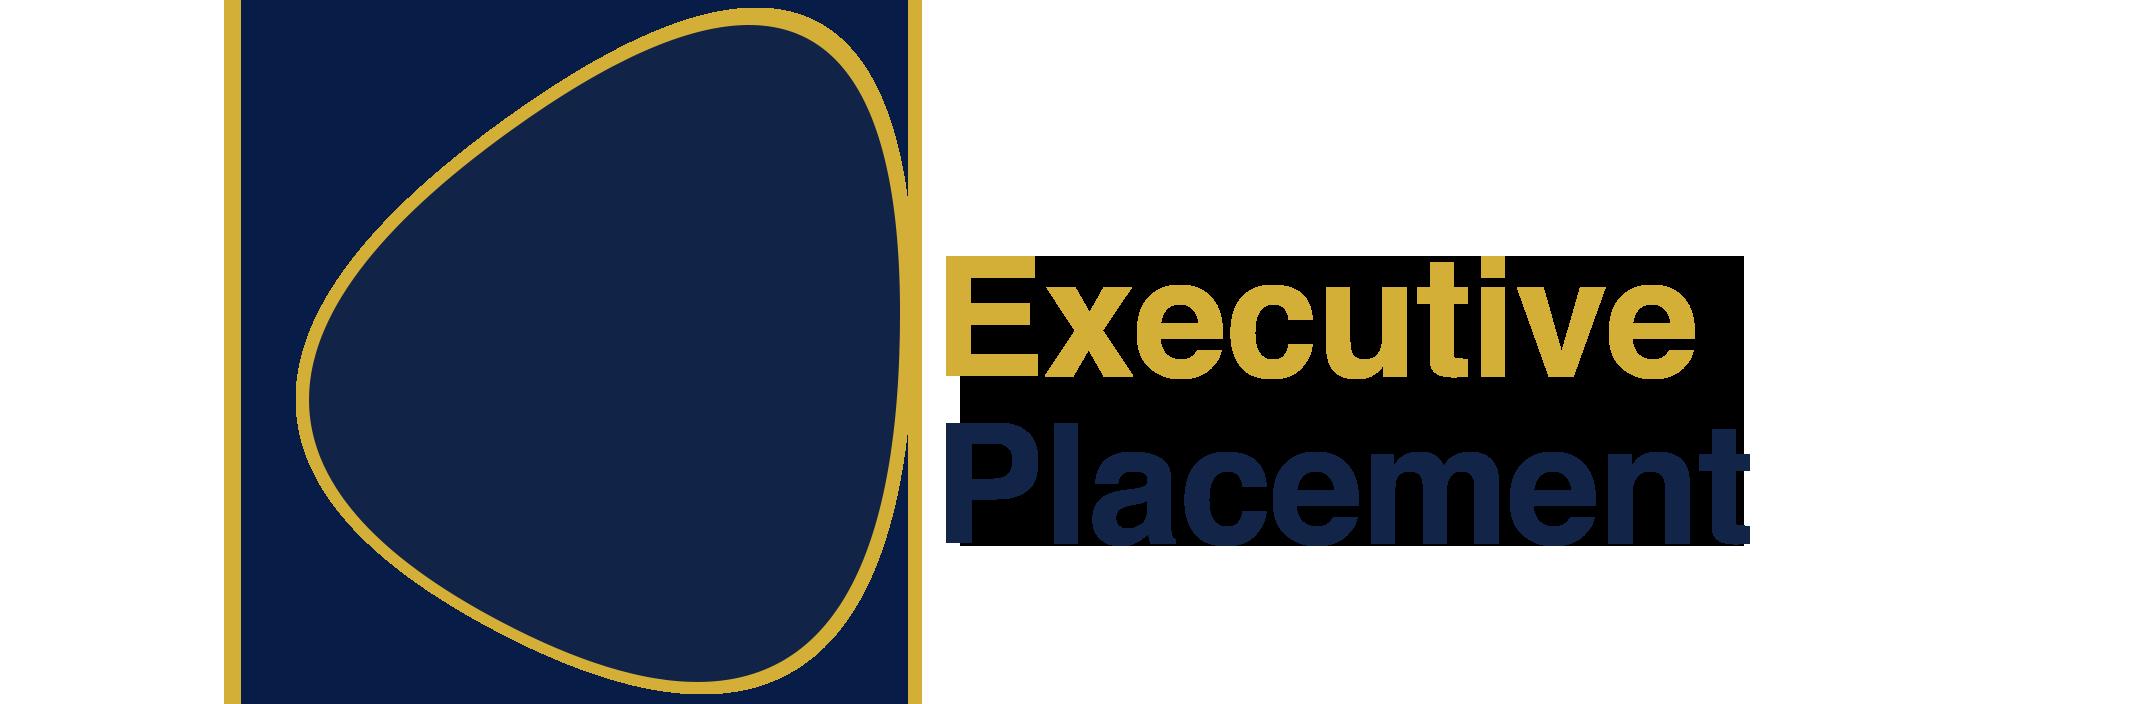 Executive Placement Ärtze